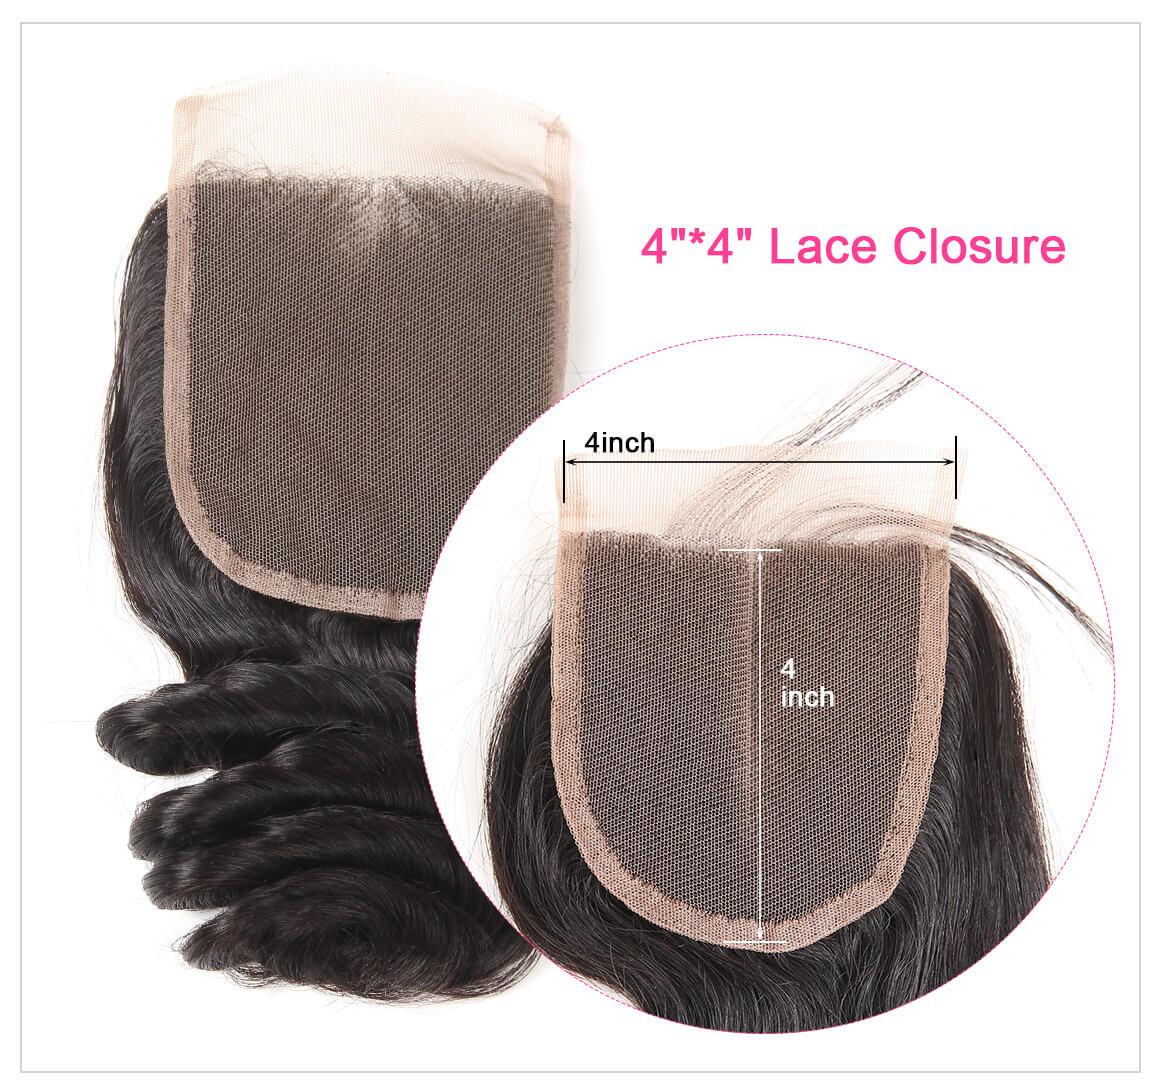 4*4 Lace Closure